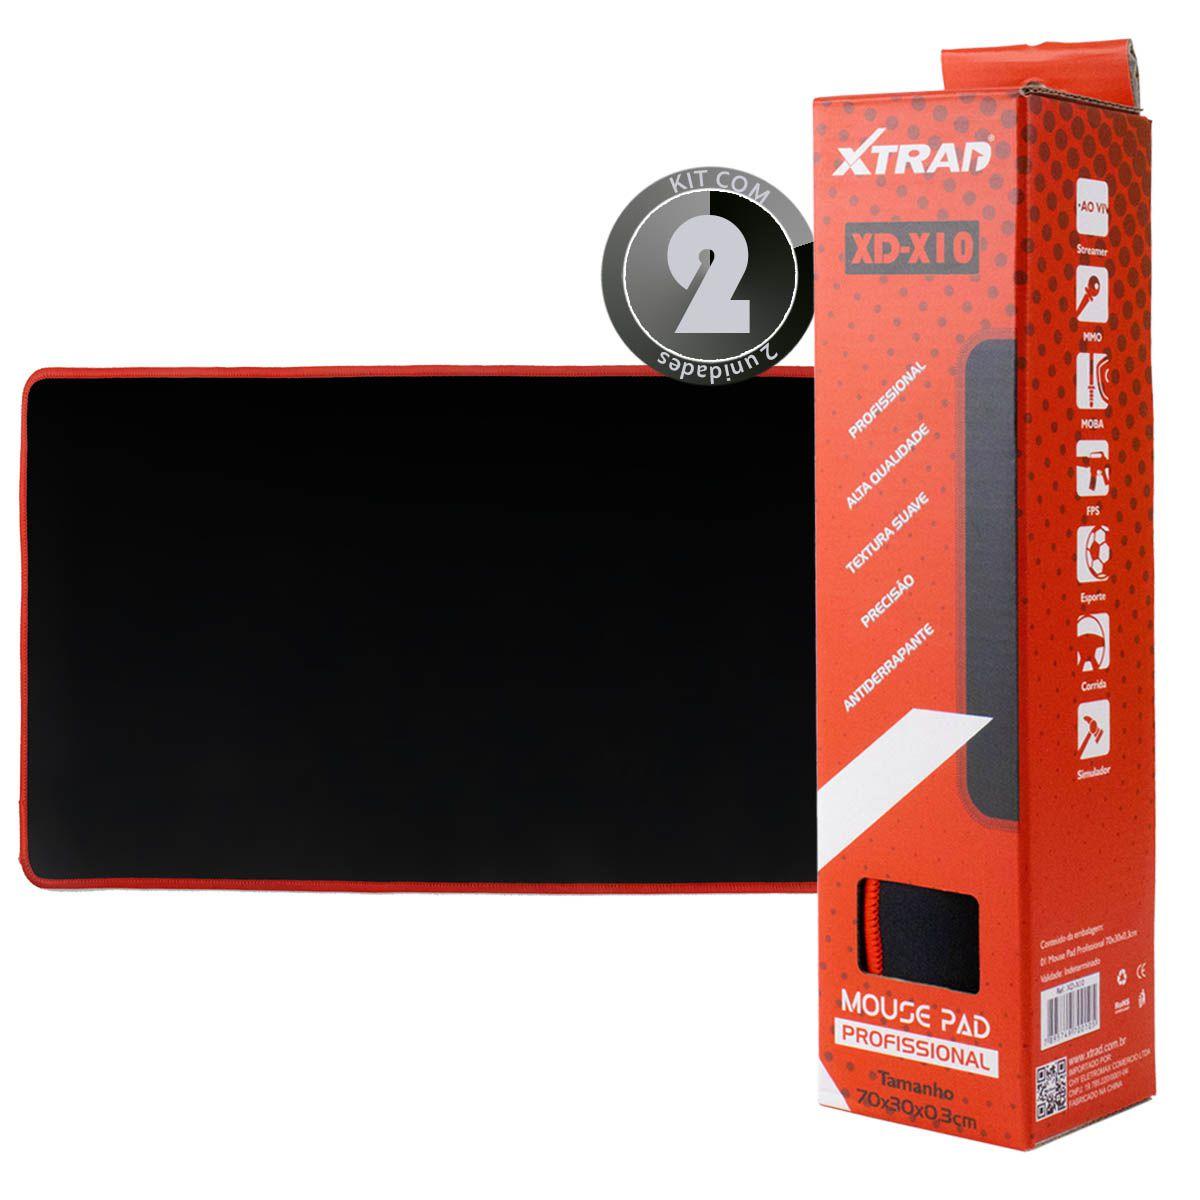 KIT 2x Mouse Pad Gamer Preto Xtrad XD-X10 Extra Grande 70x30cm